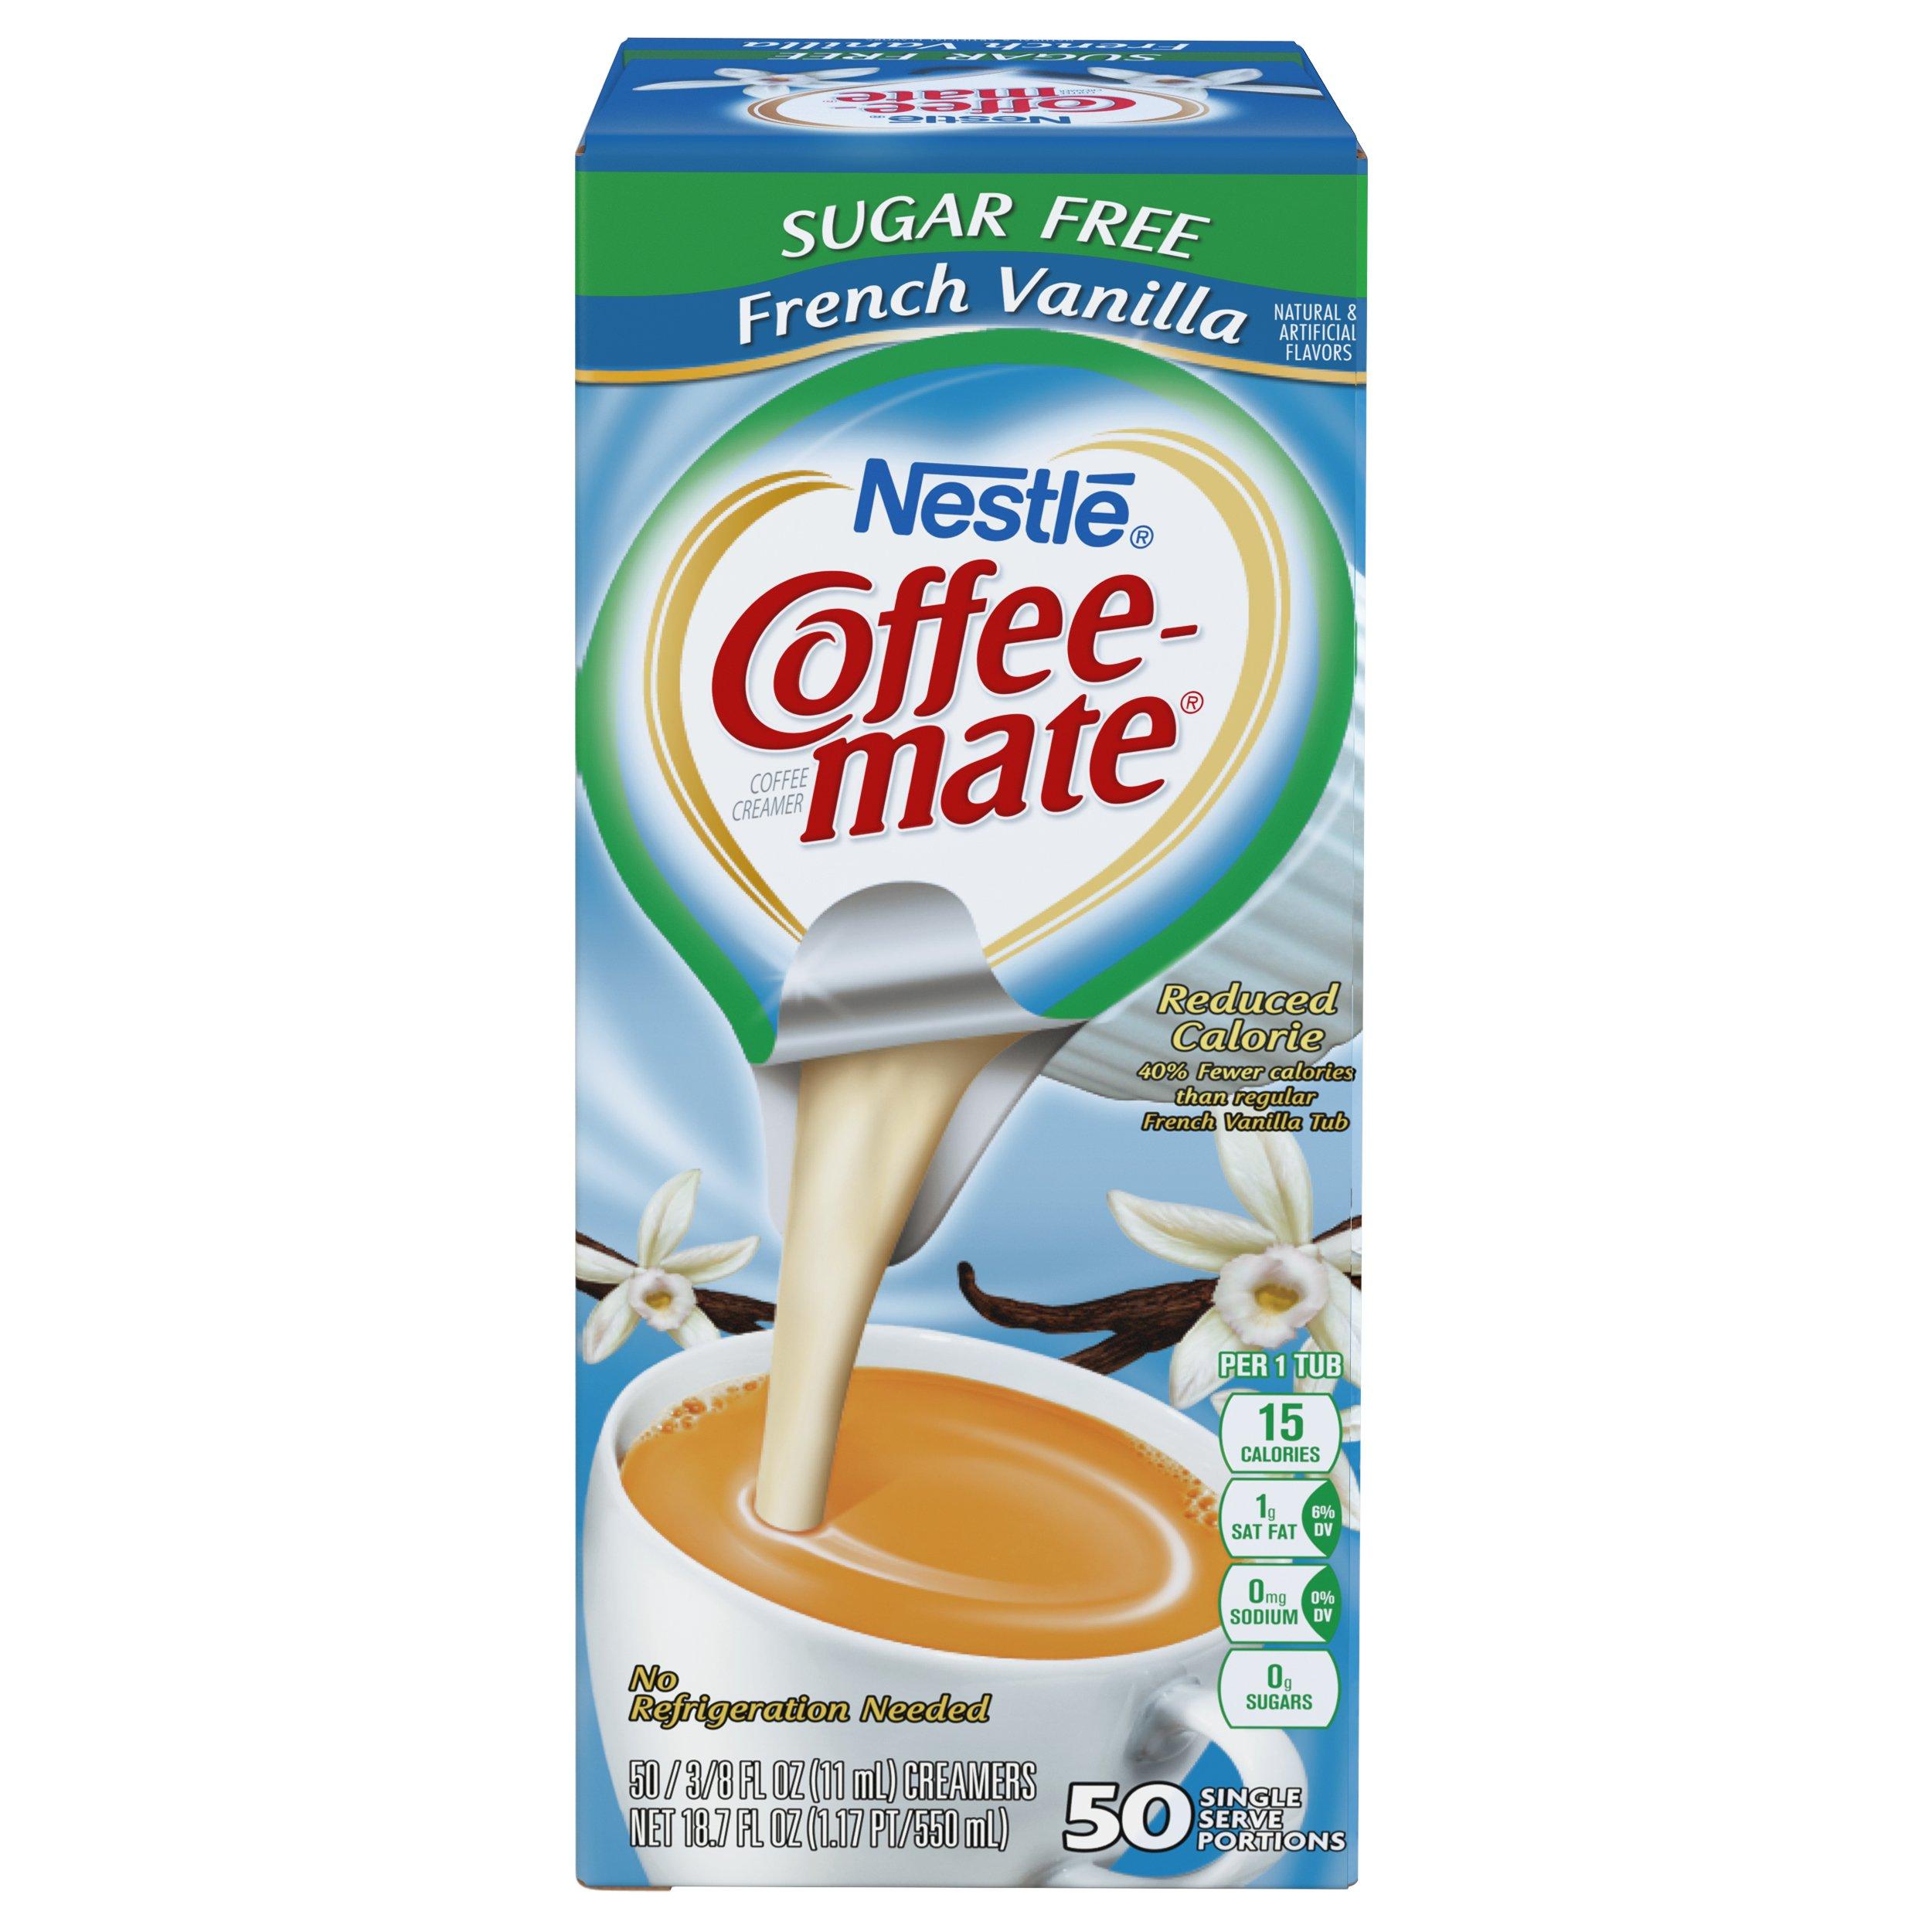 NESTLE COFFEE-MATE Coffee Creamer, Sugar Free French Vanilla, liquid creamer singles, Pack of 50 by Nestle Coffee Mate (Image #4)